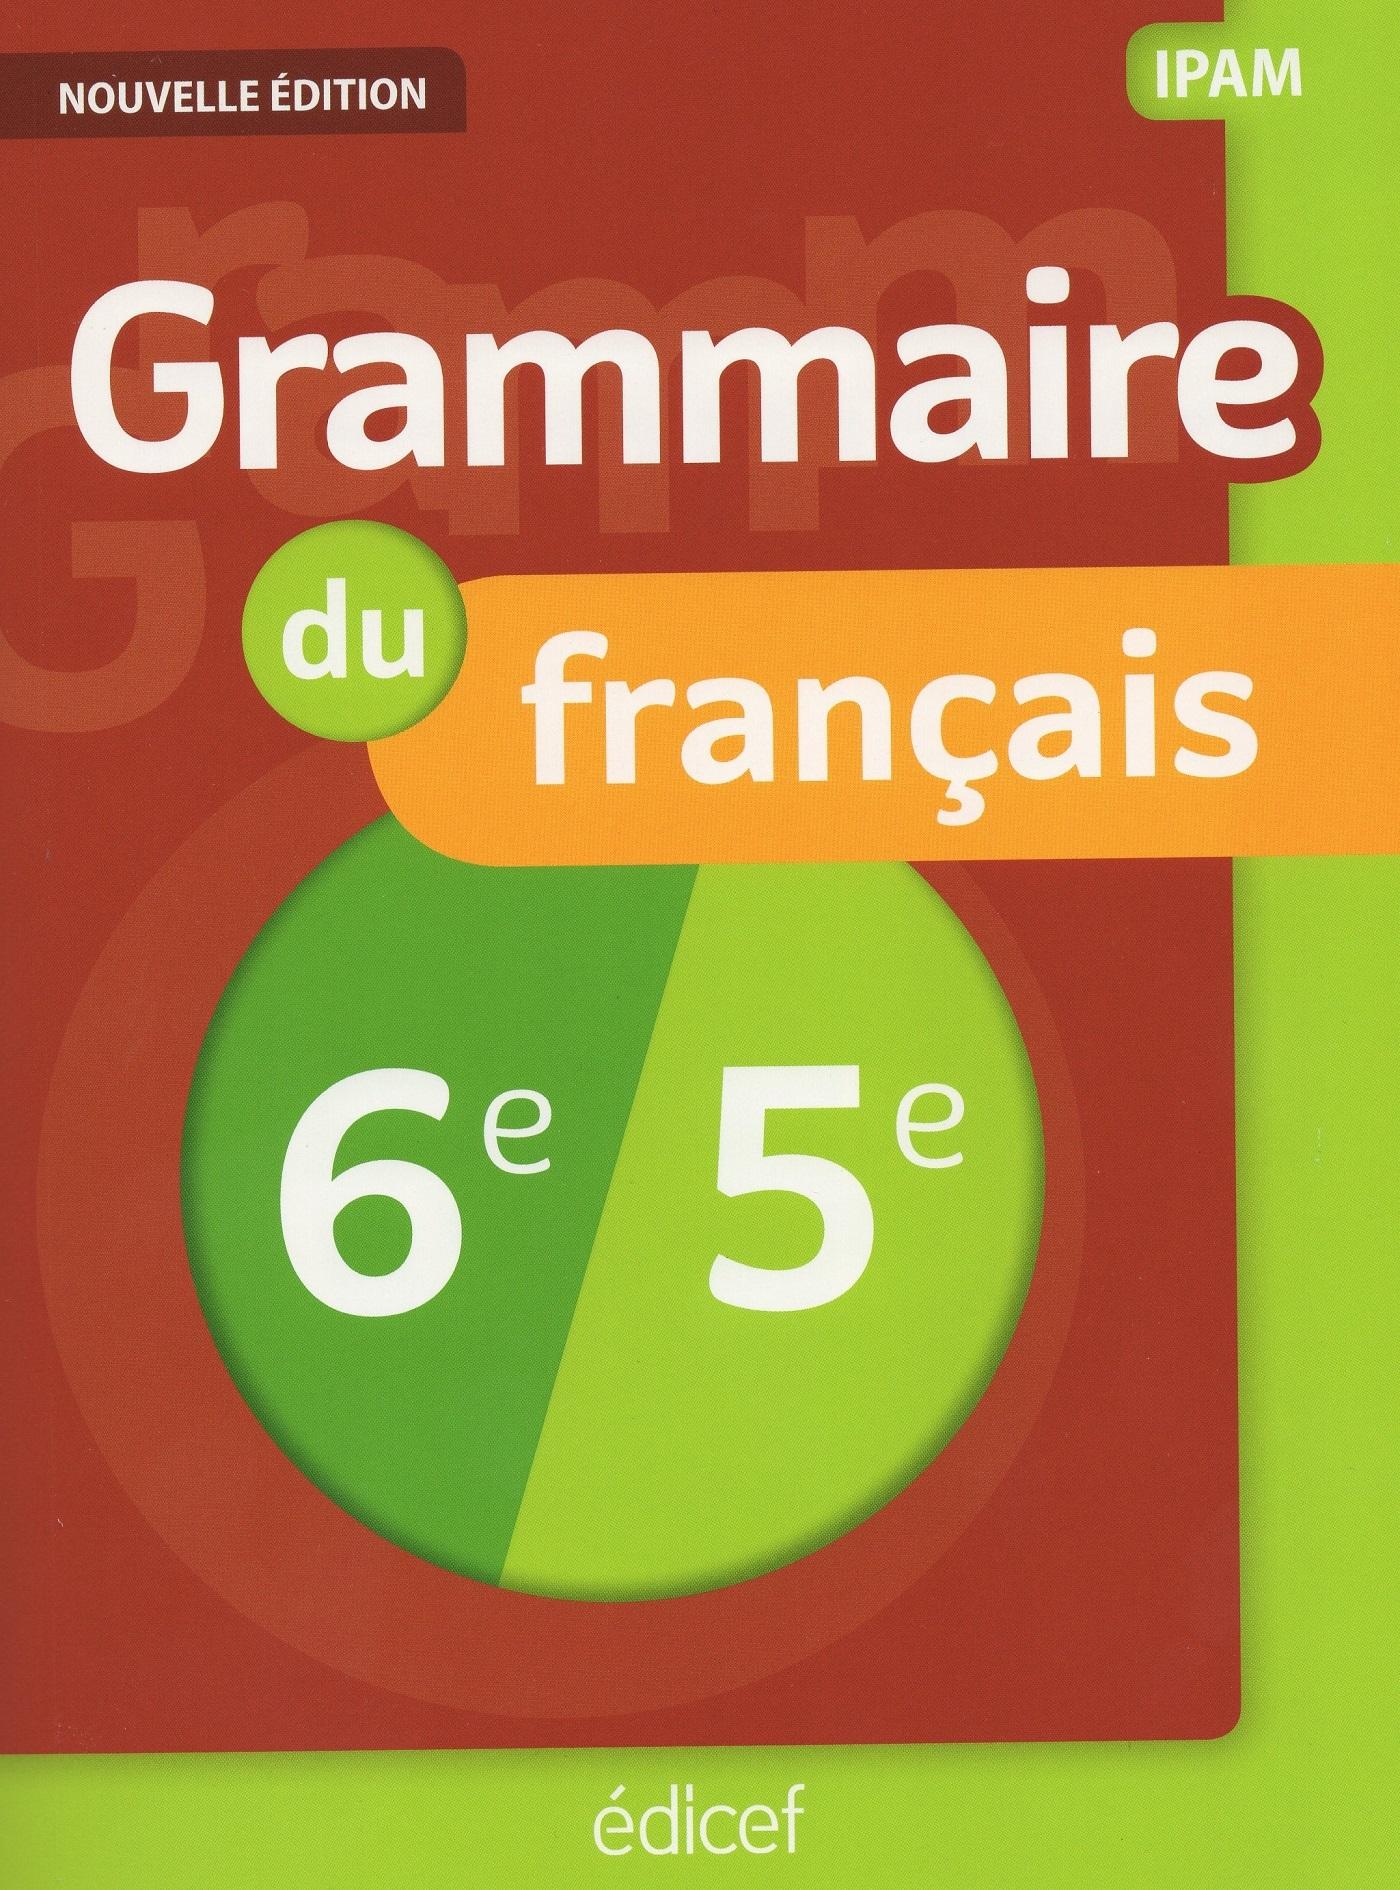 GRAMMAIRE 6E/5E IPAM ELEVE NOUVELLE EDITION